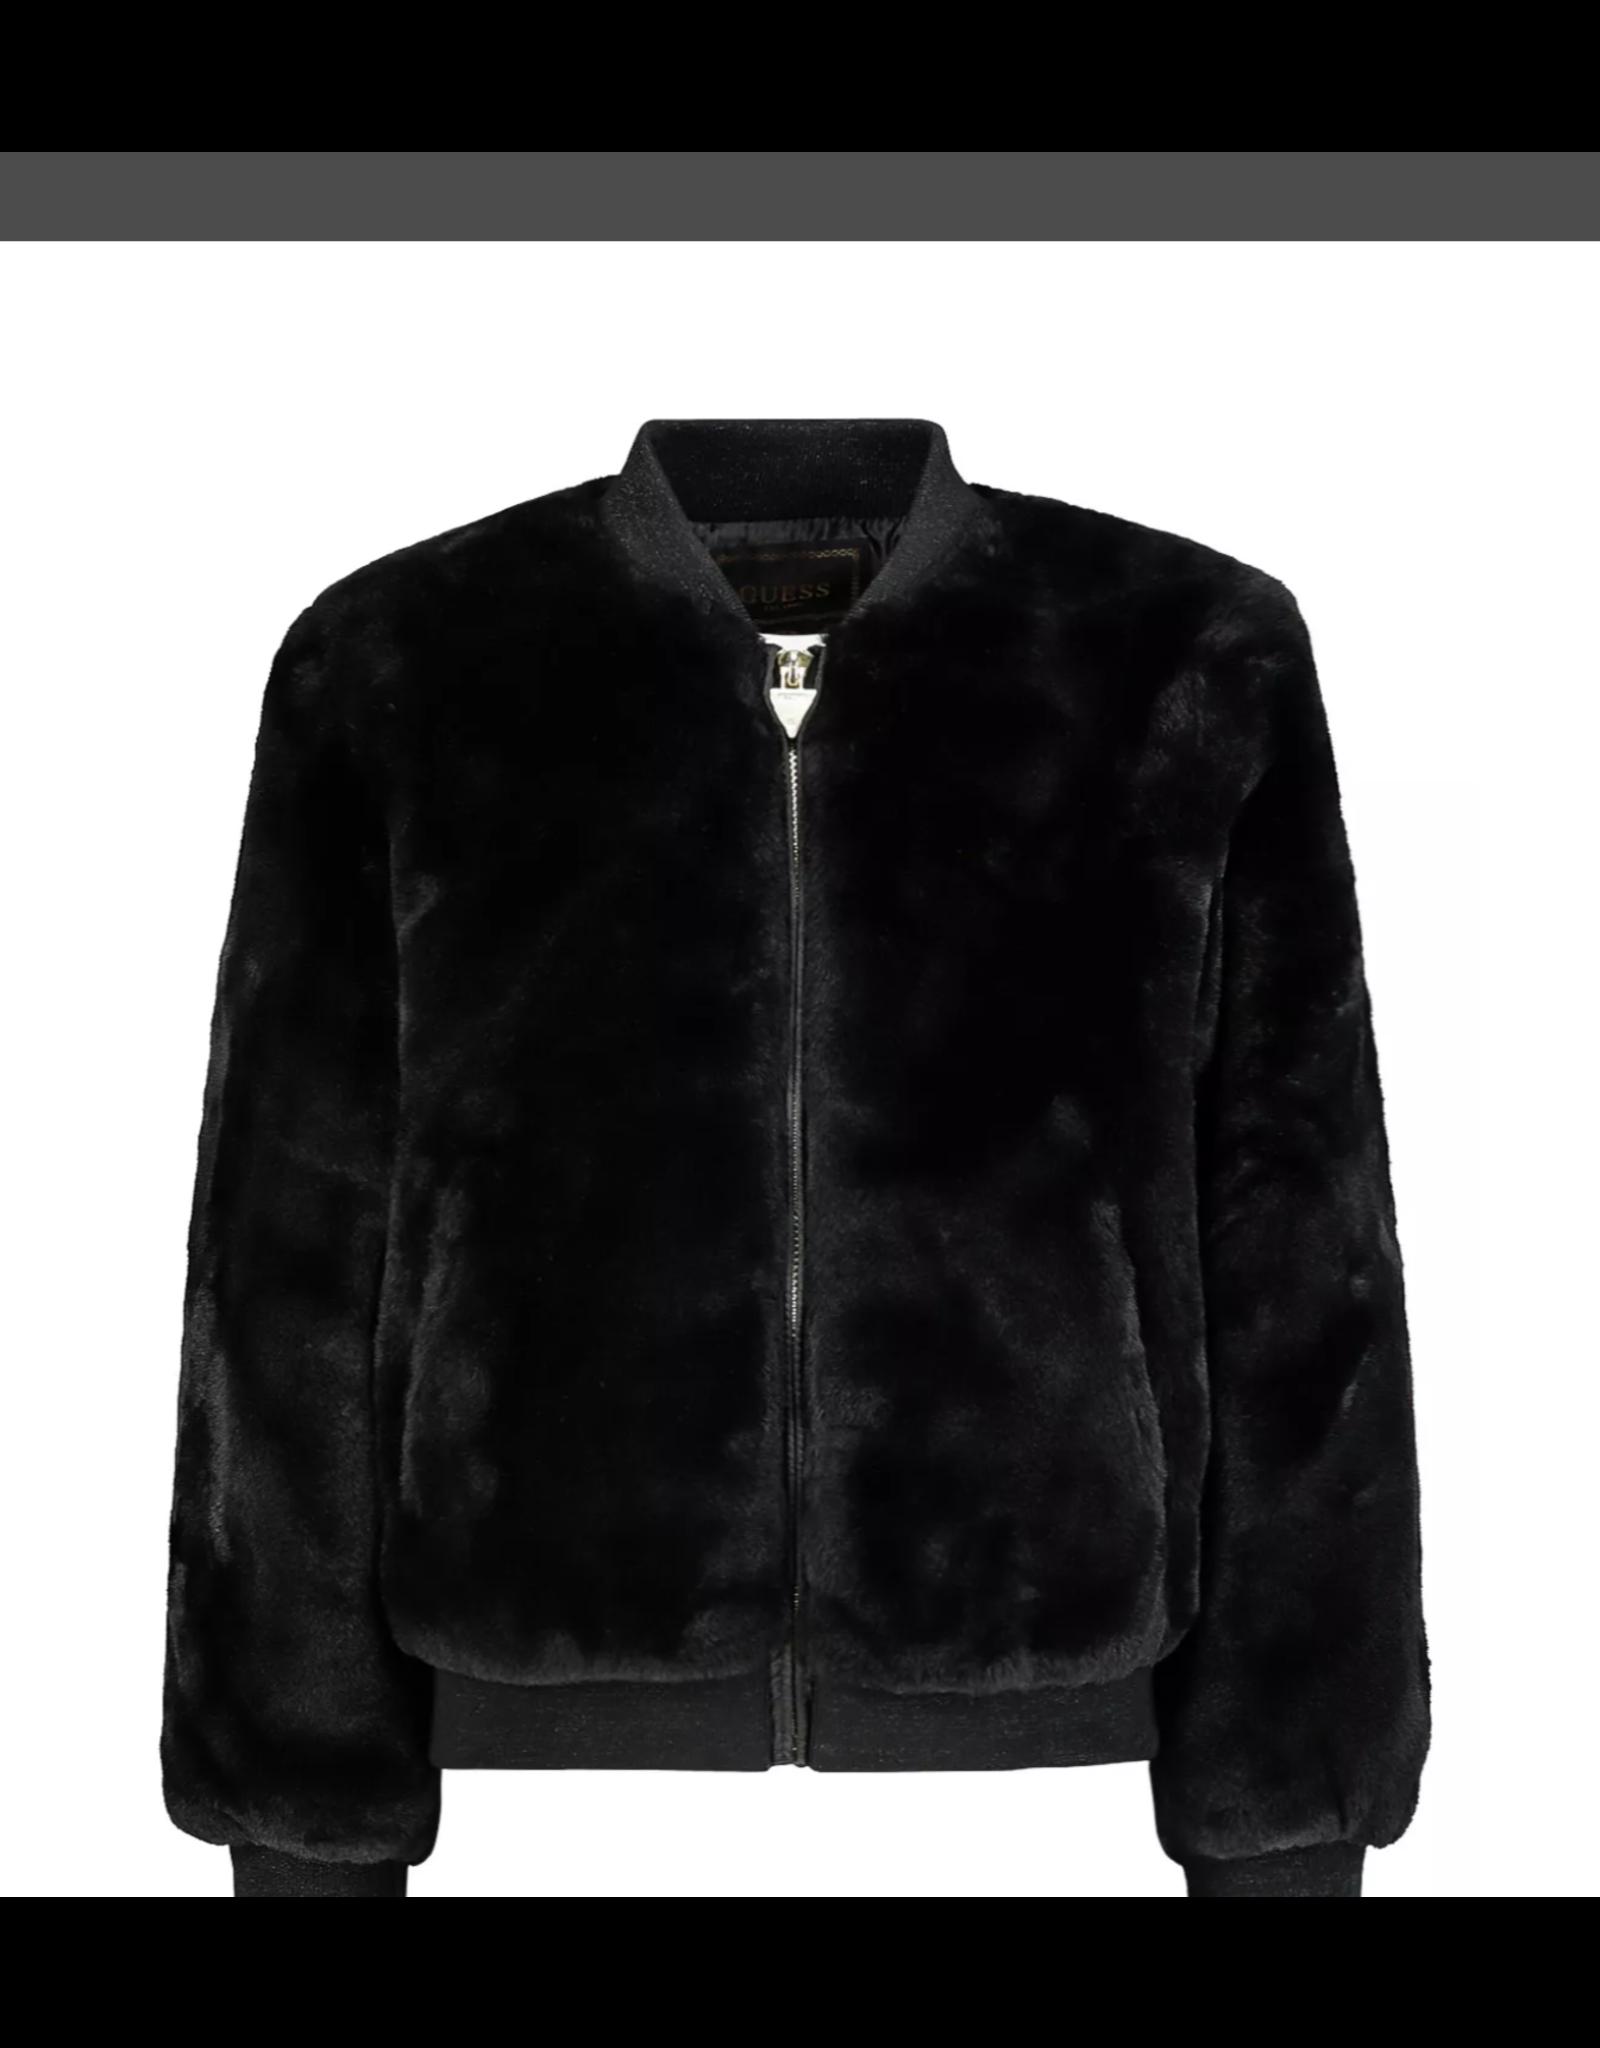 Guess Fluffy Jacket Black